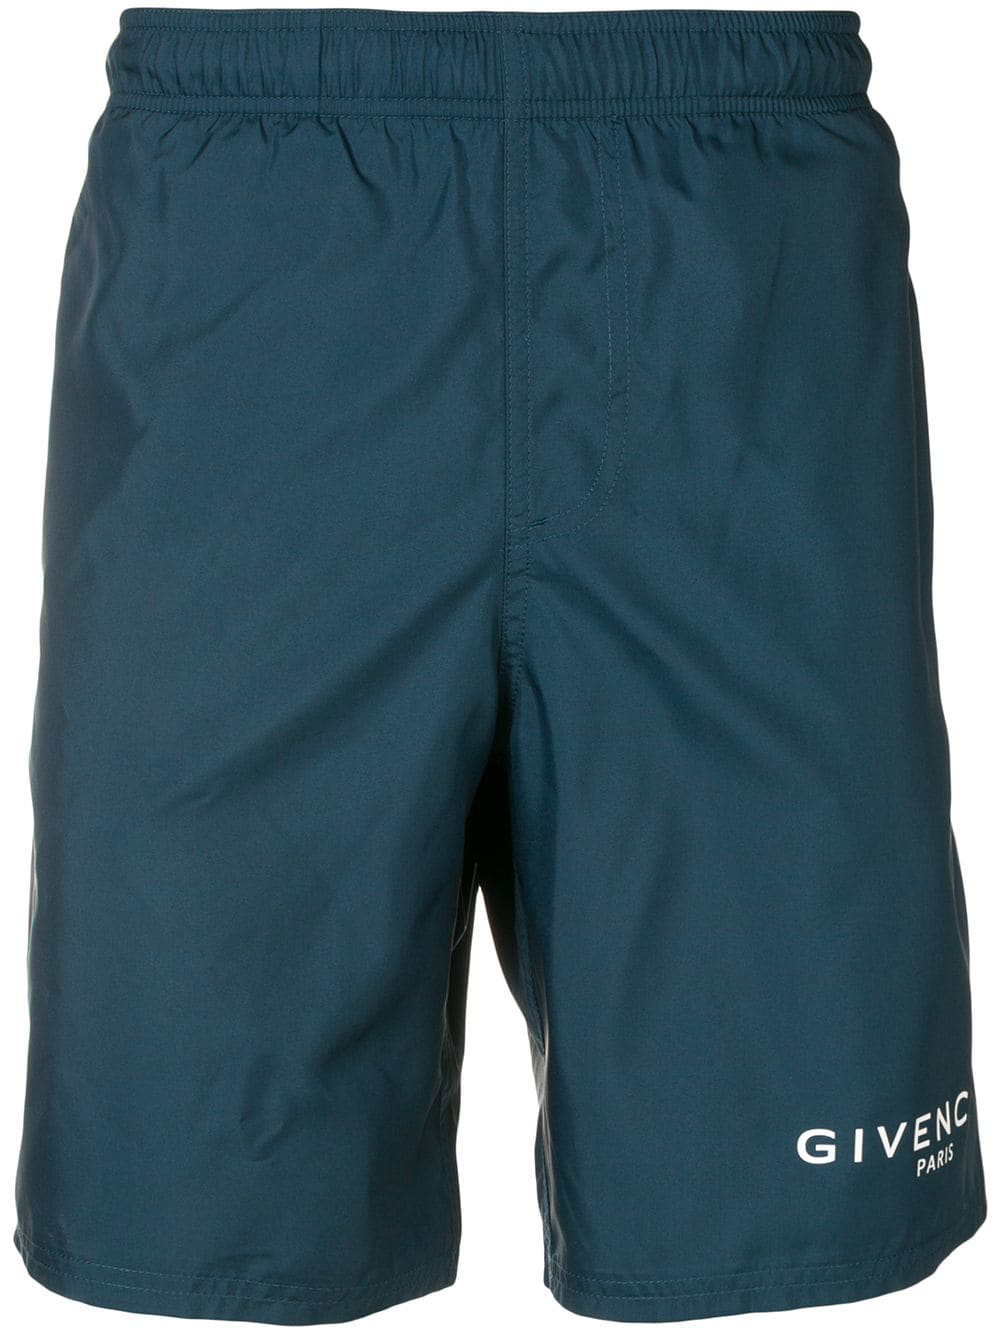 aab15a5fee0296 Givenchy Logo Swim Shorts - Blue